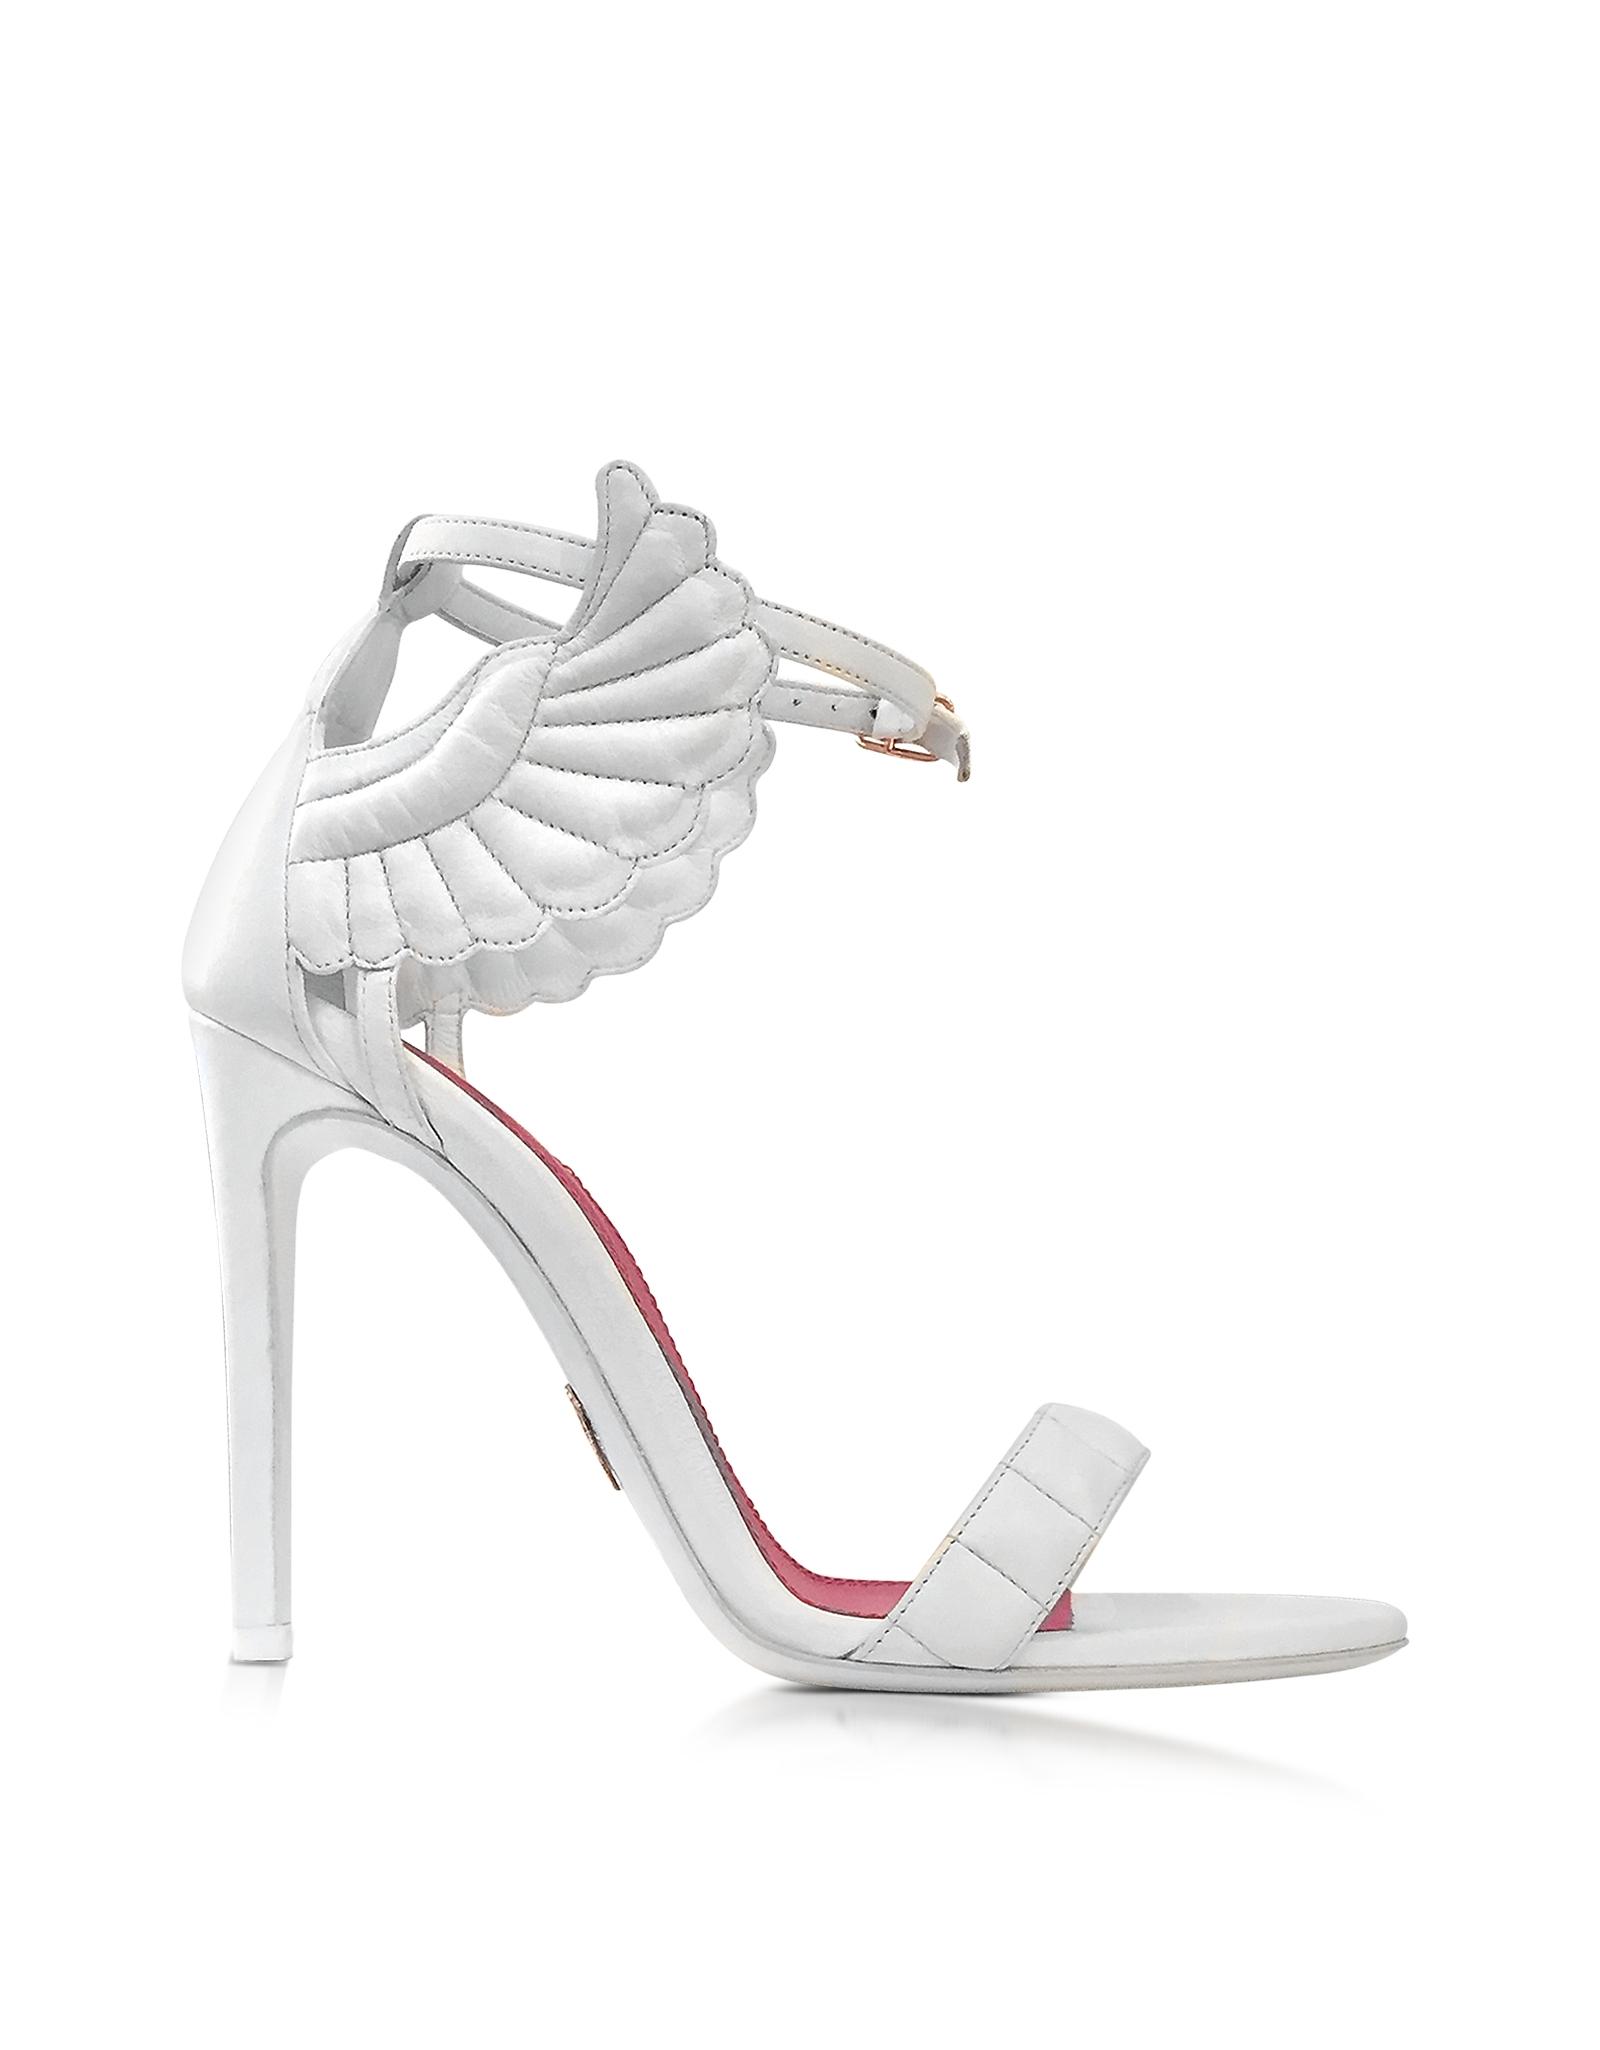 Lyst - Oscar tiye Malikah White Nappa High Heel Sandal in White